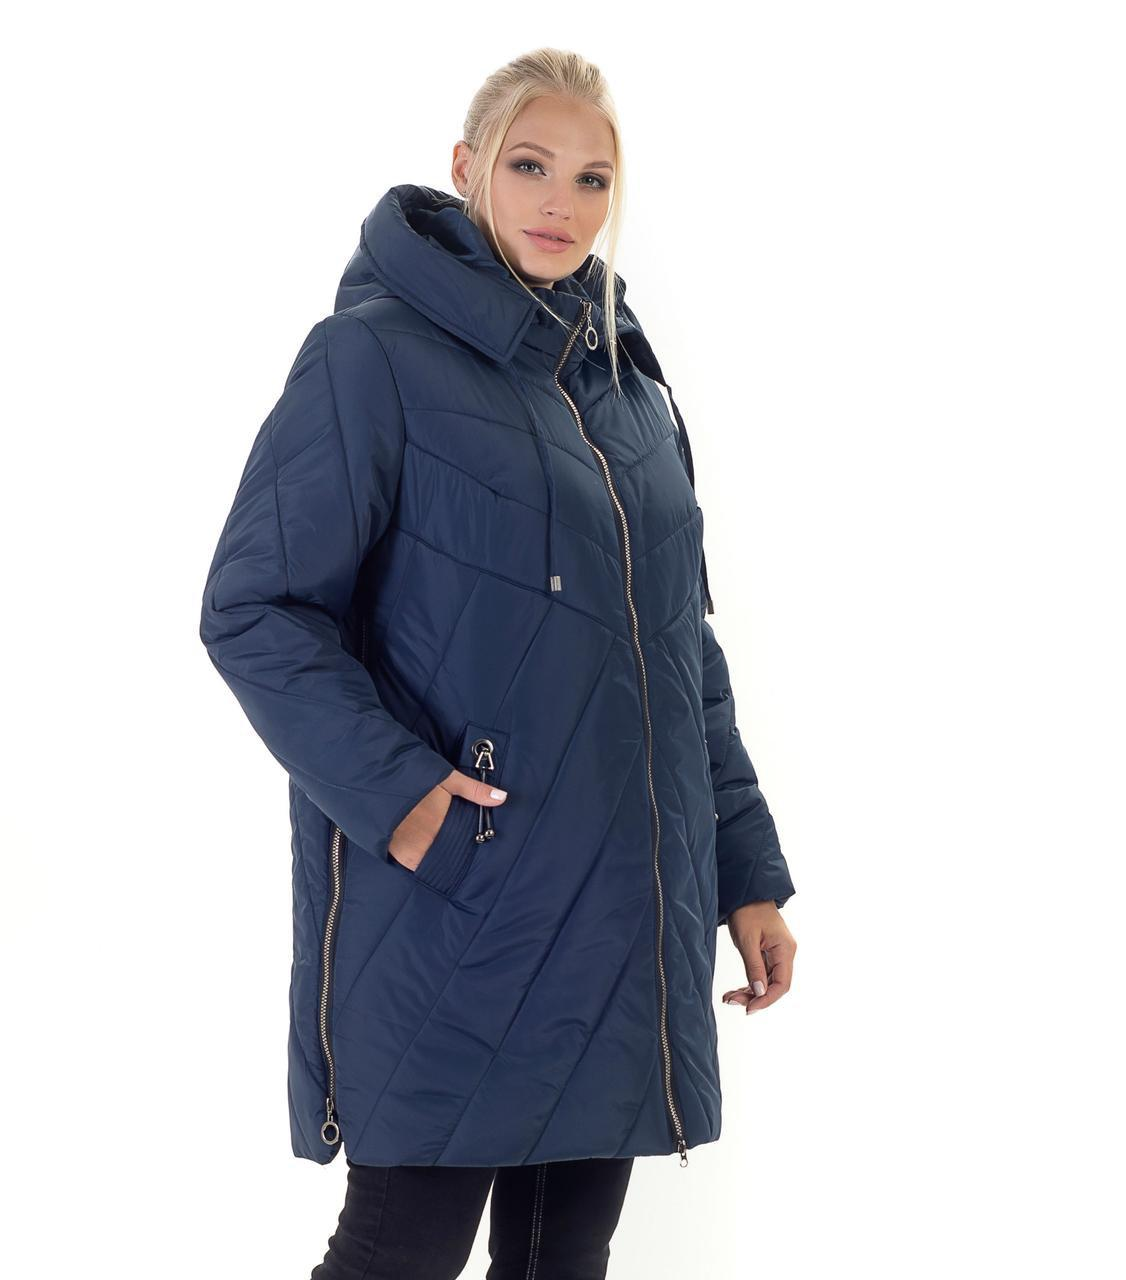 Женский зимний пуховик / куртка синий большихразмеров размер 56 58 60 62 64 66 68 70